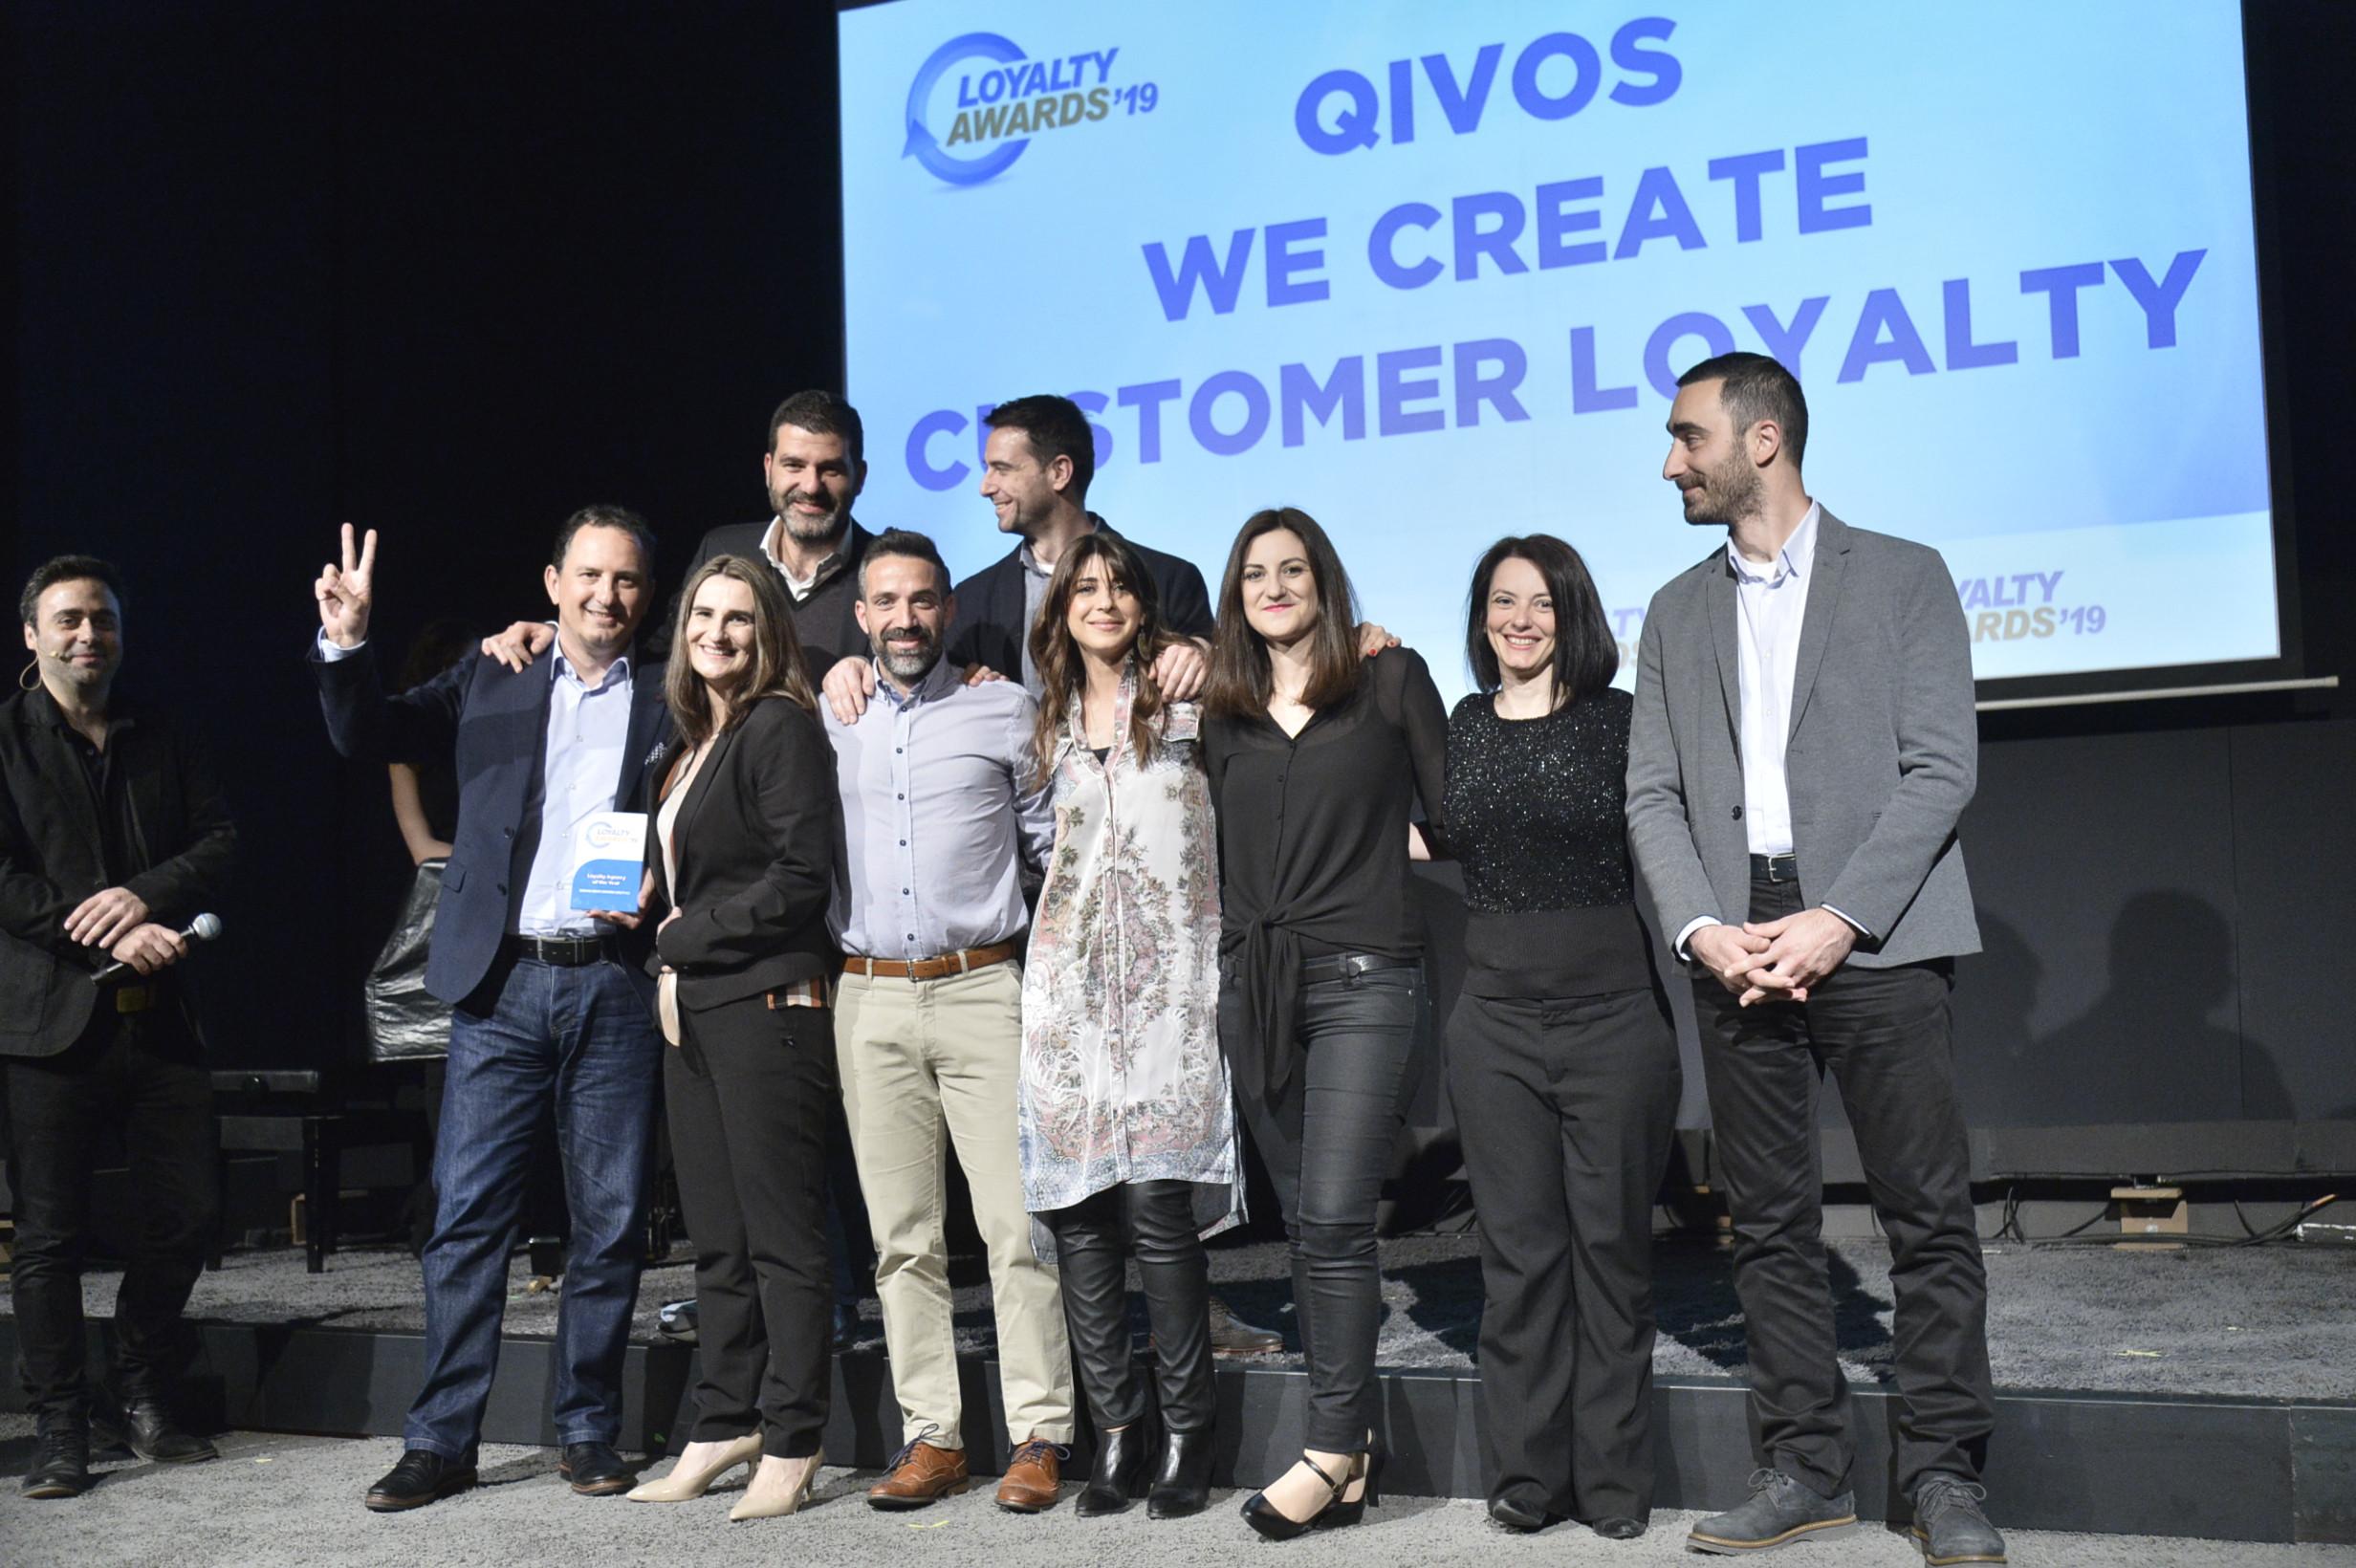 QIVOS team